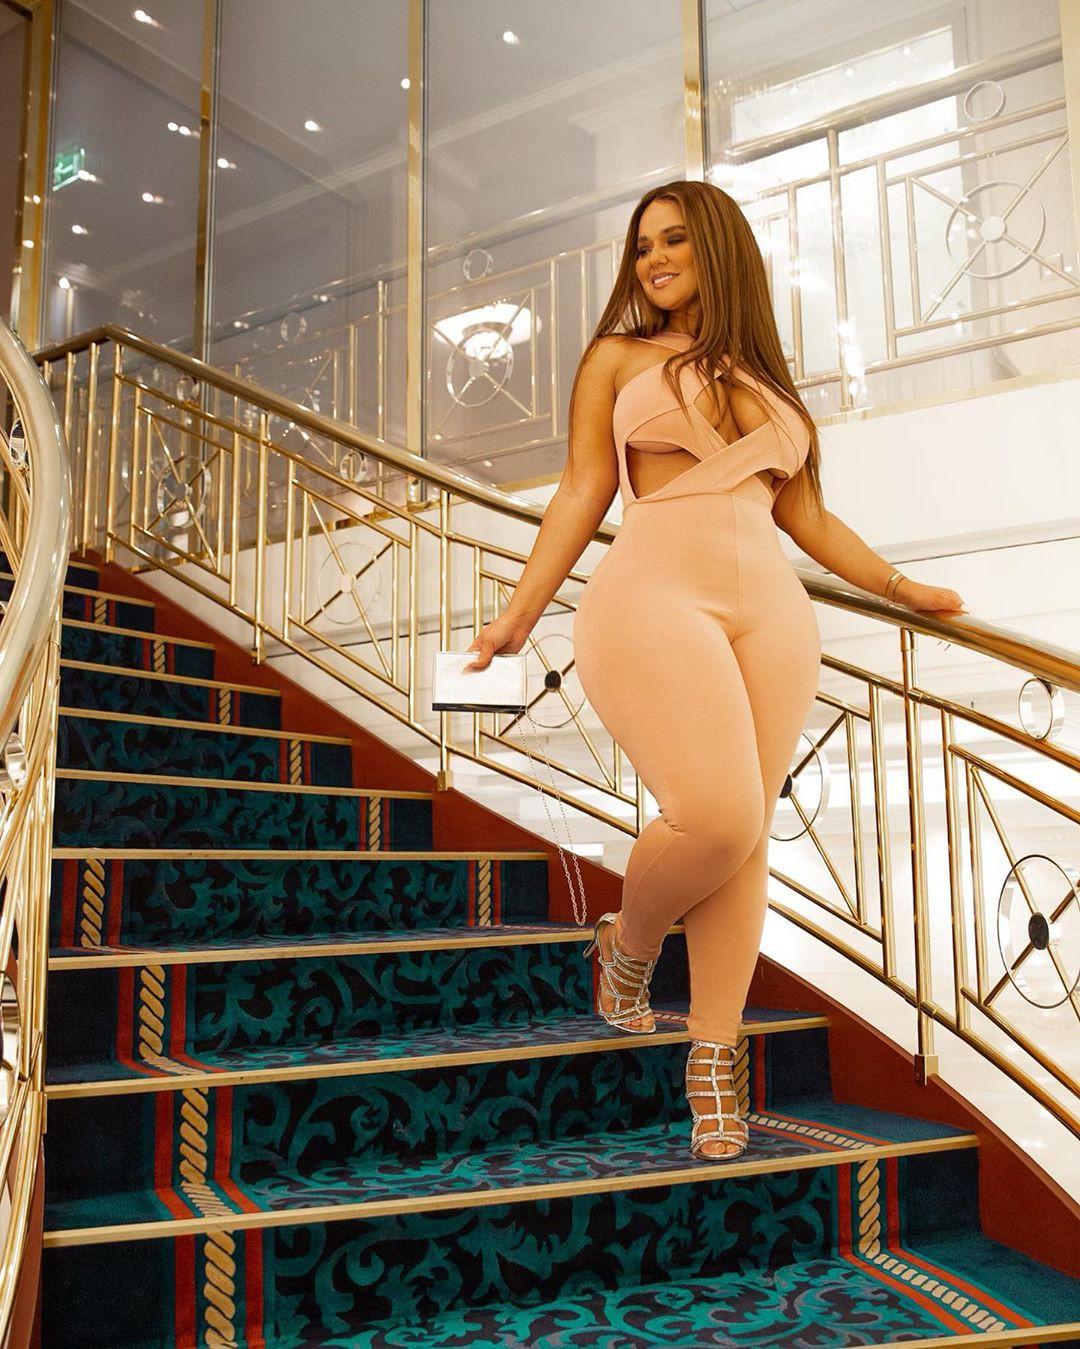 Pamela Alexandra dress colour combination, girls photoshoot, legs pic